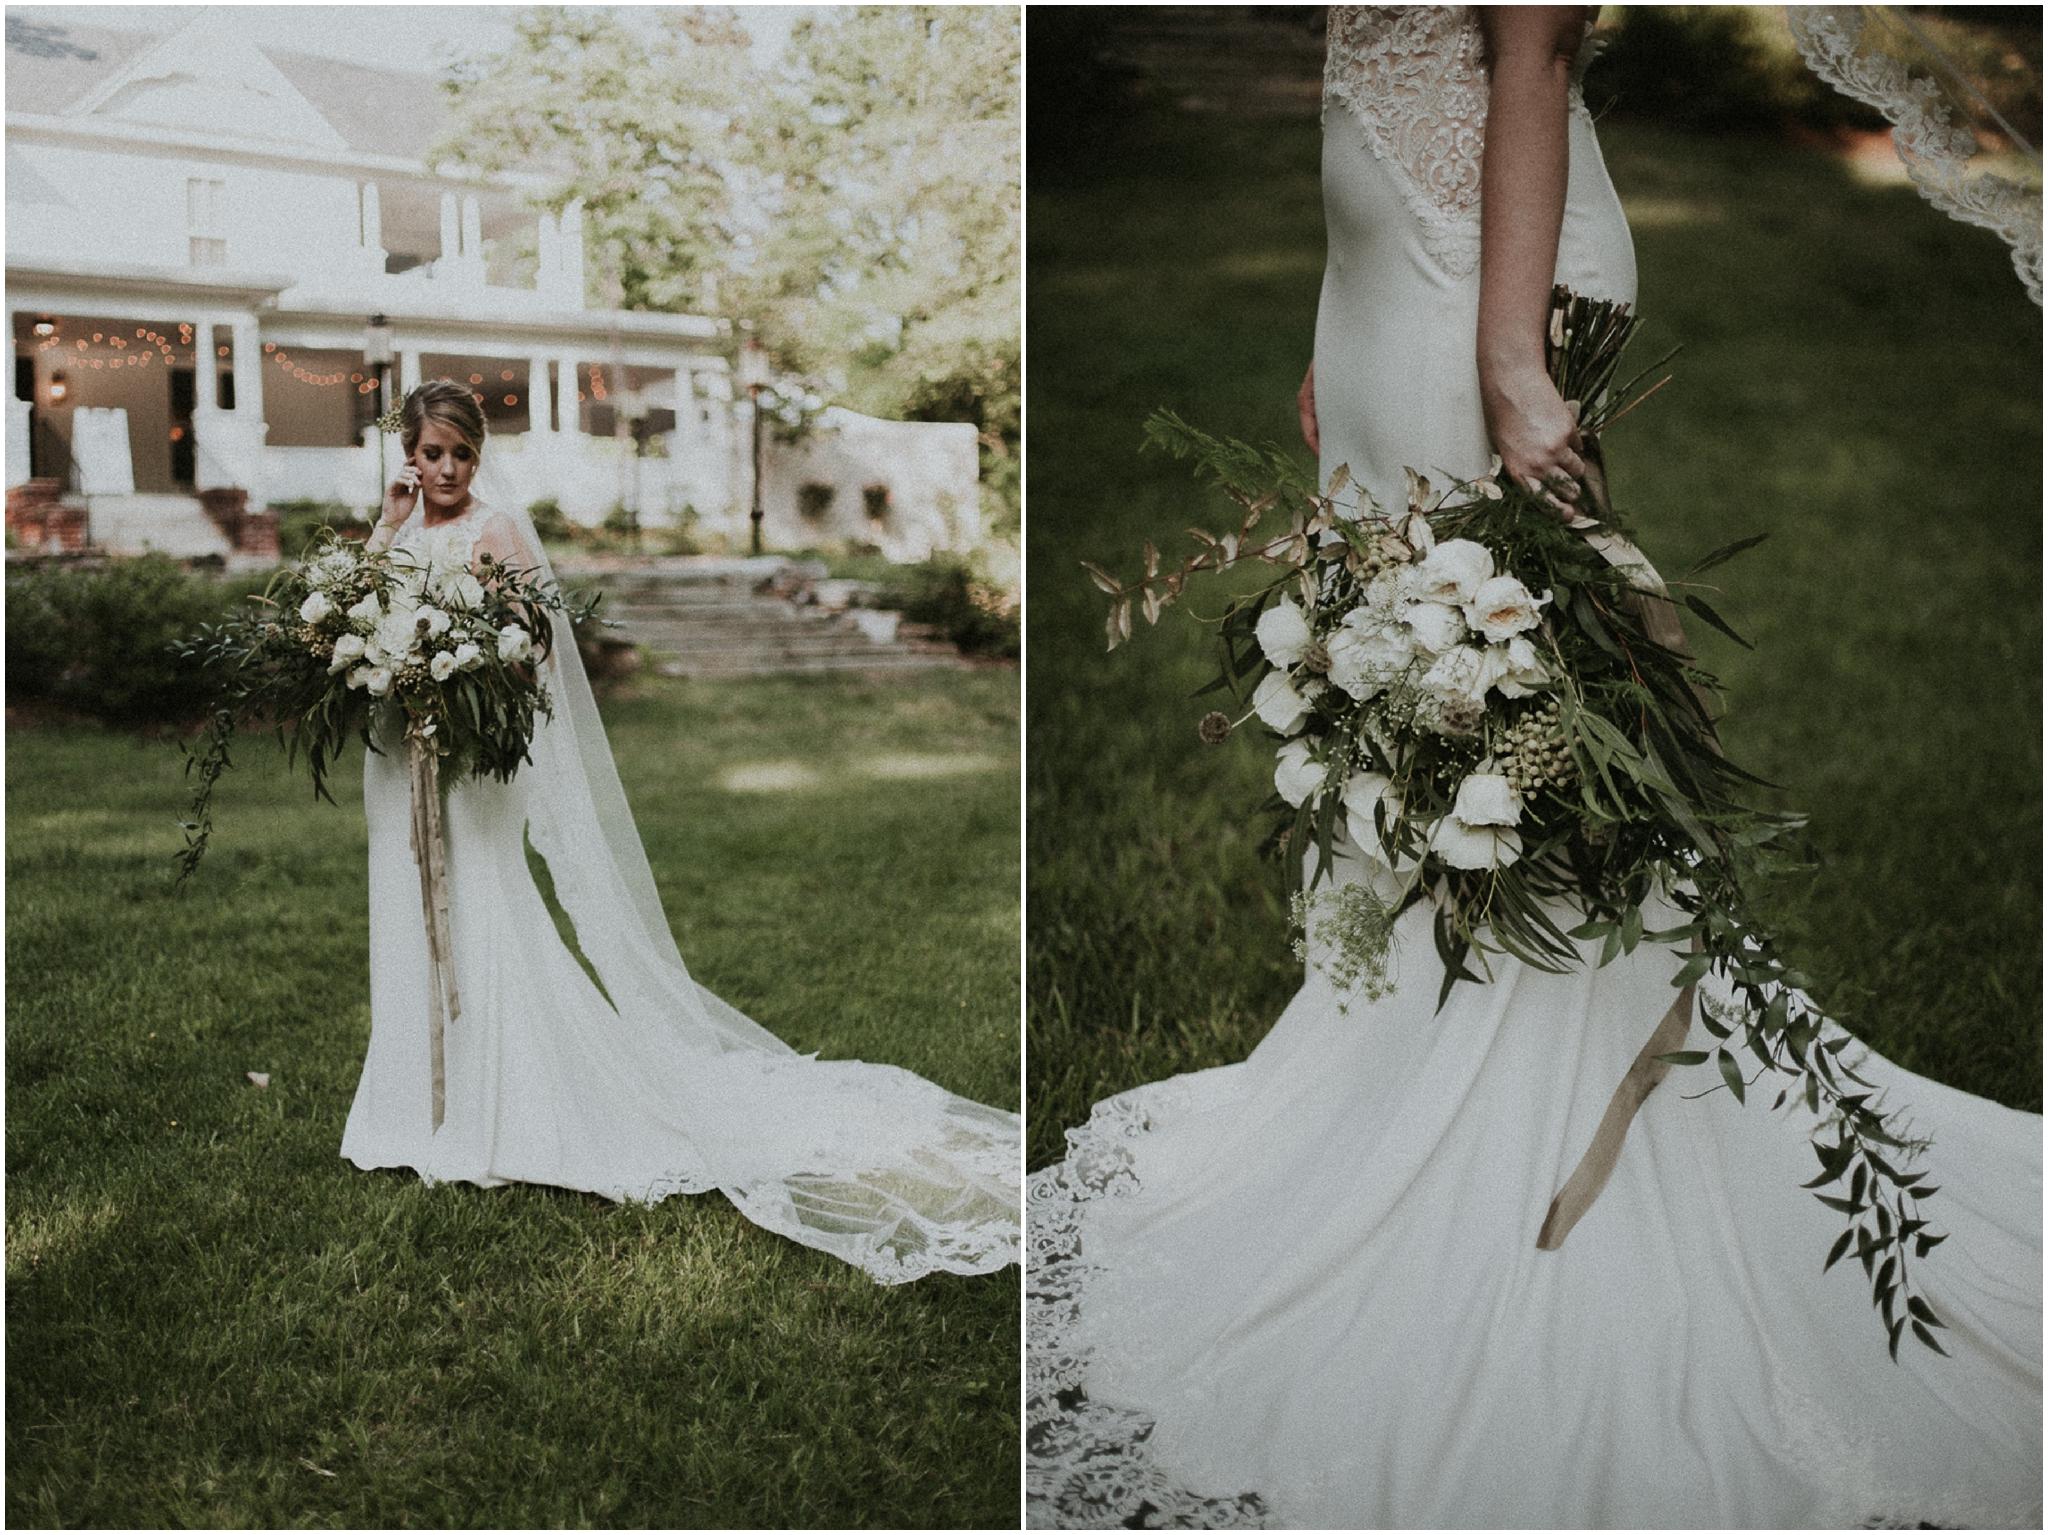 Wedding-photographer-ritchie-hill_0020.jpg